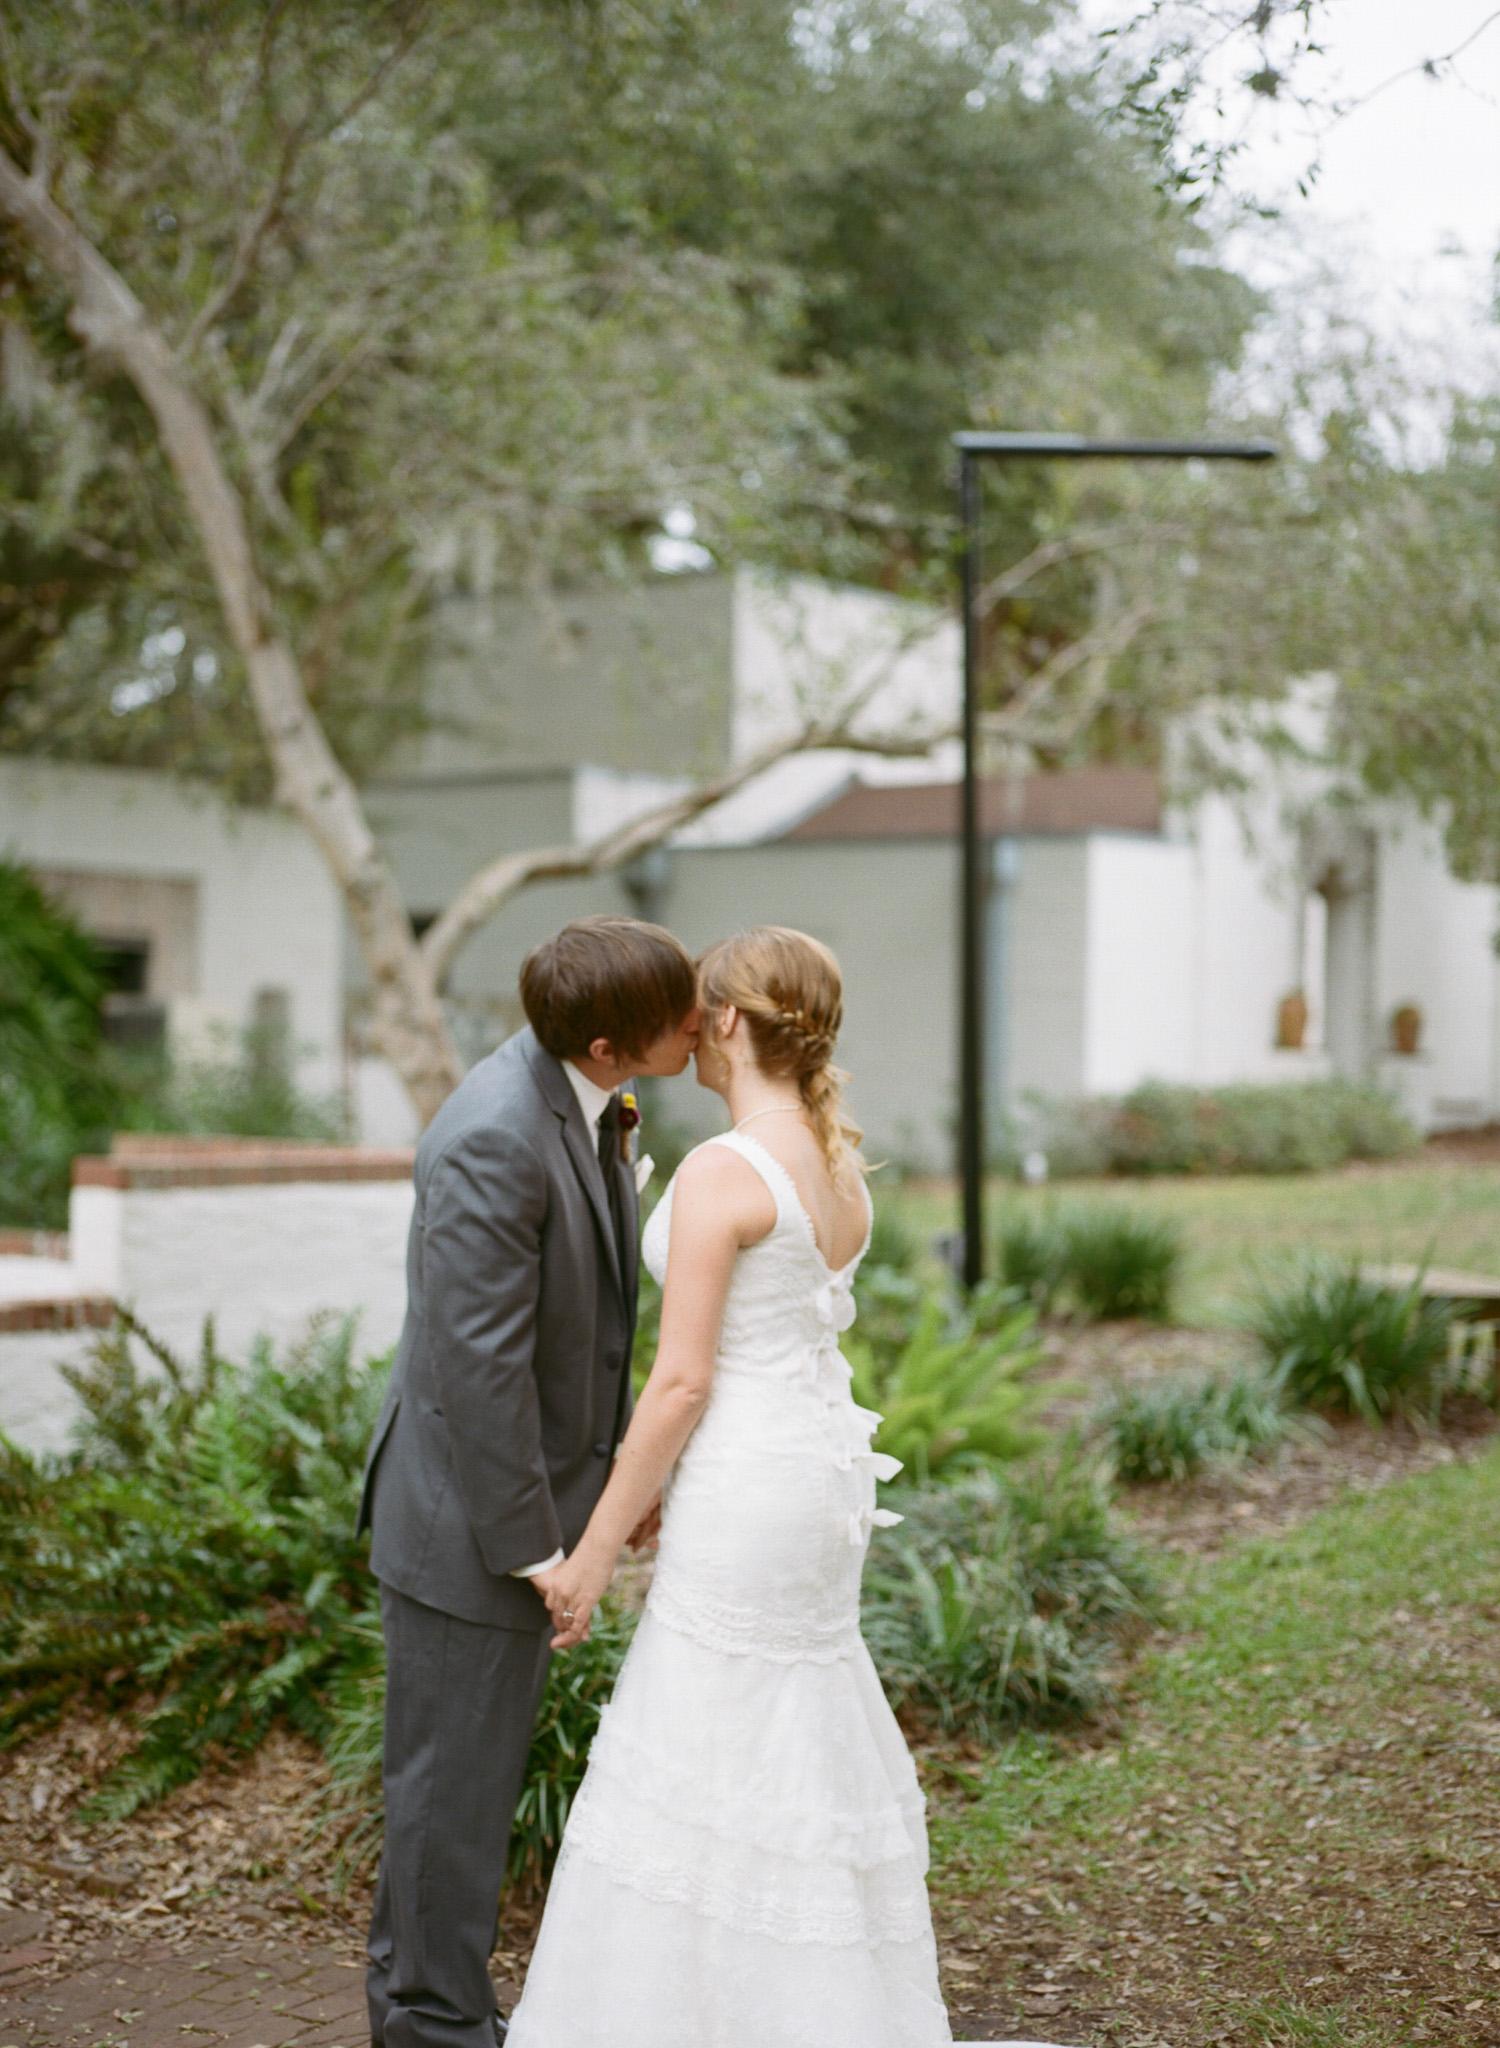 Christina-Matt-Maitland-Art-Center-Wedding48.JPG